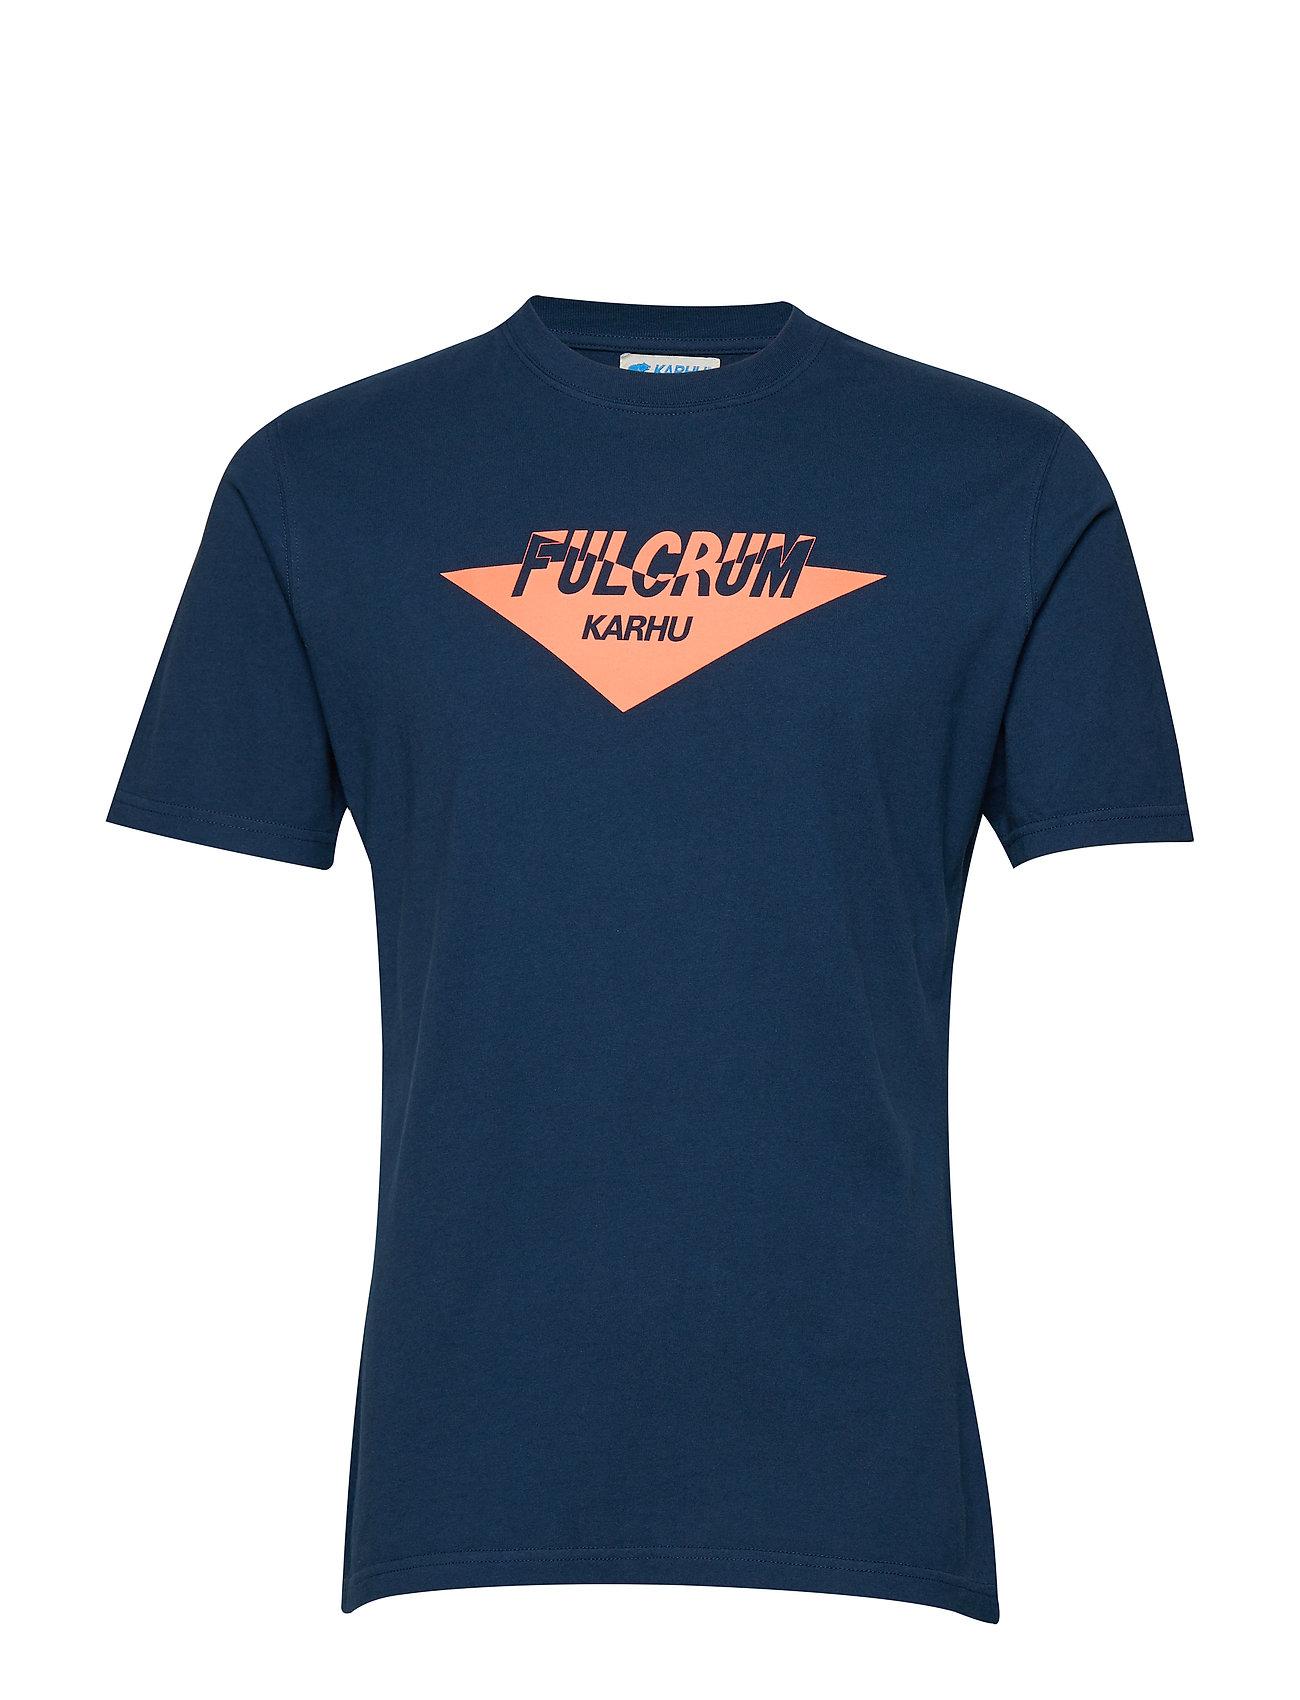 CoralKarhu hot Fulcrum T shirtnavy Poseidon HEDW29eIY